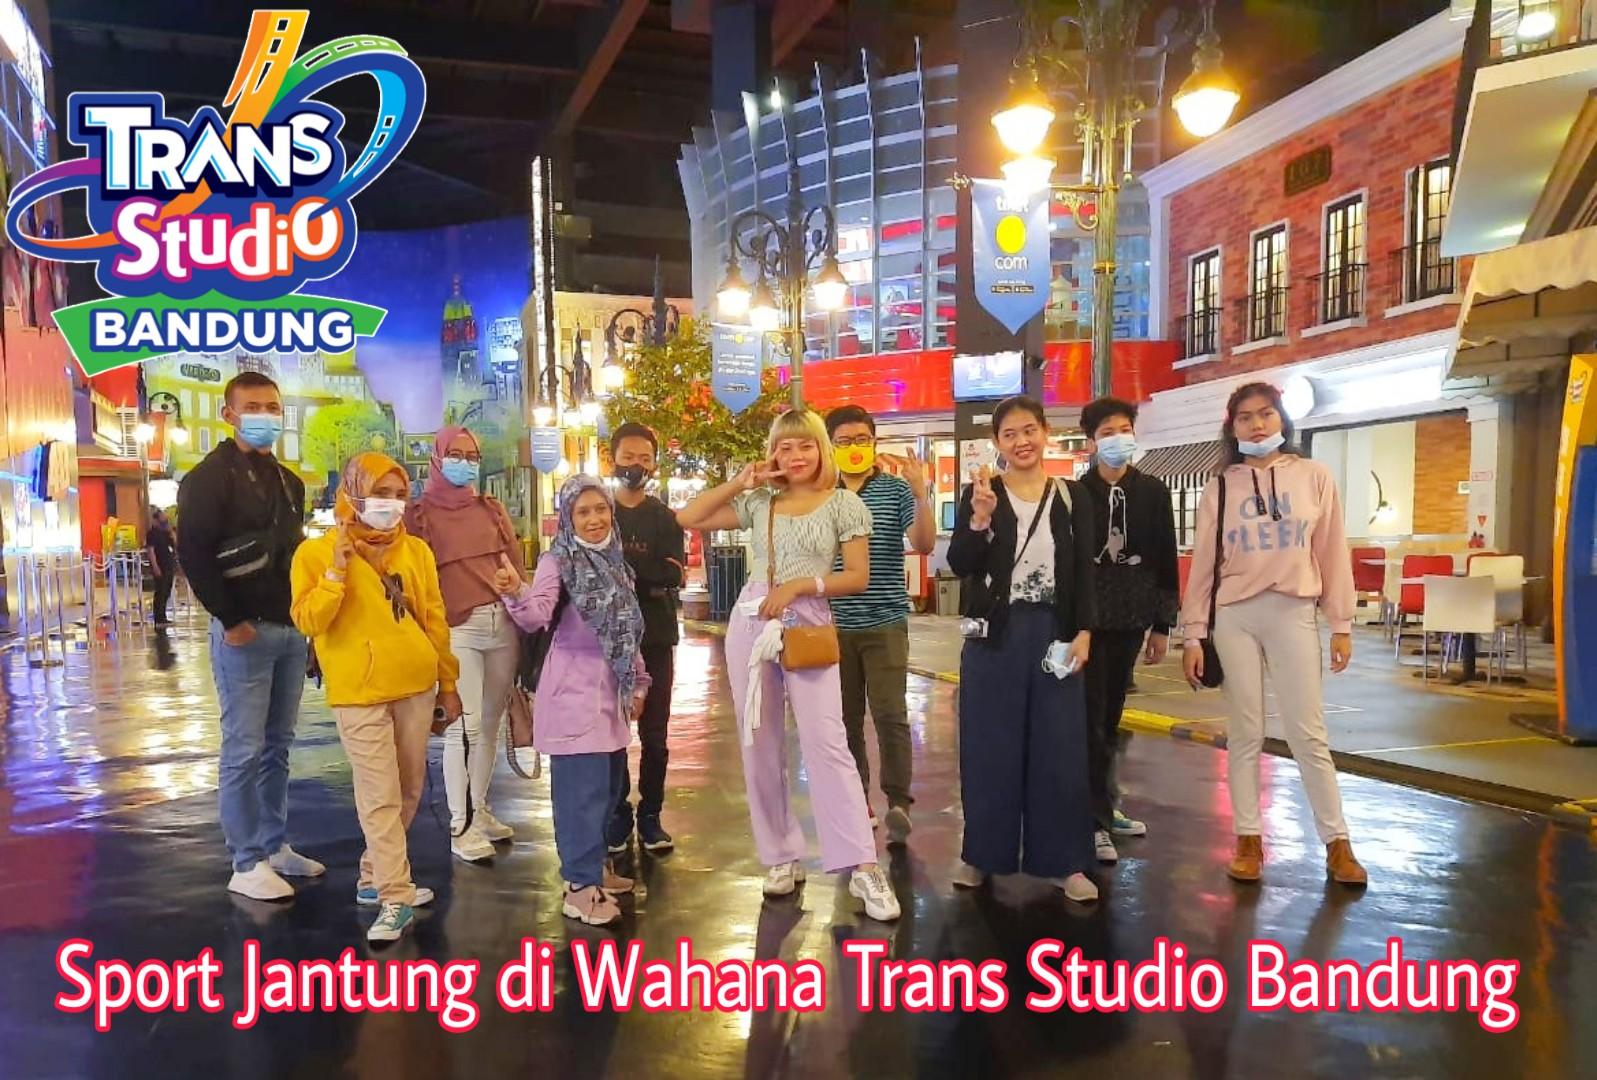 Wahana Trans Studio Bandung